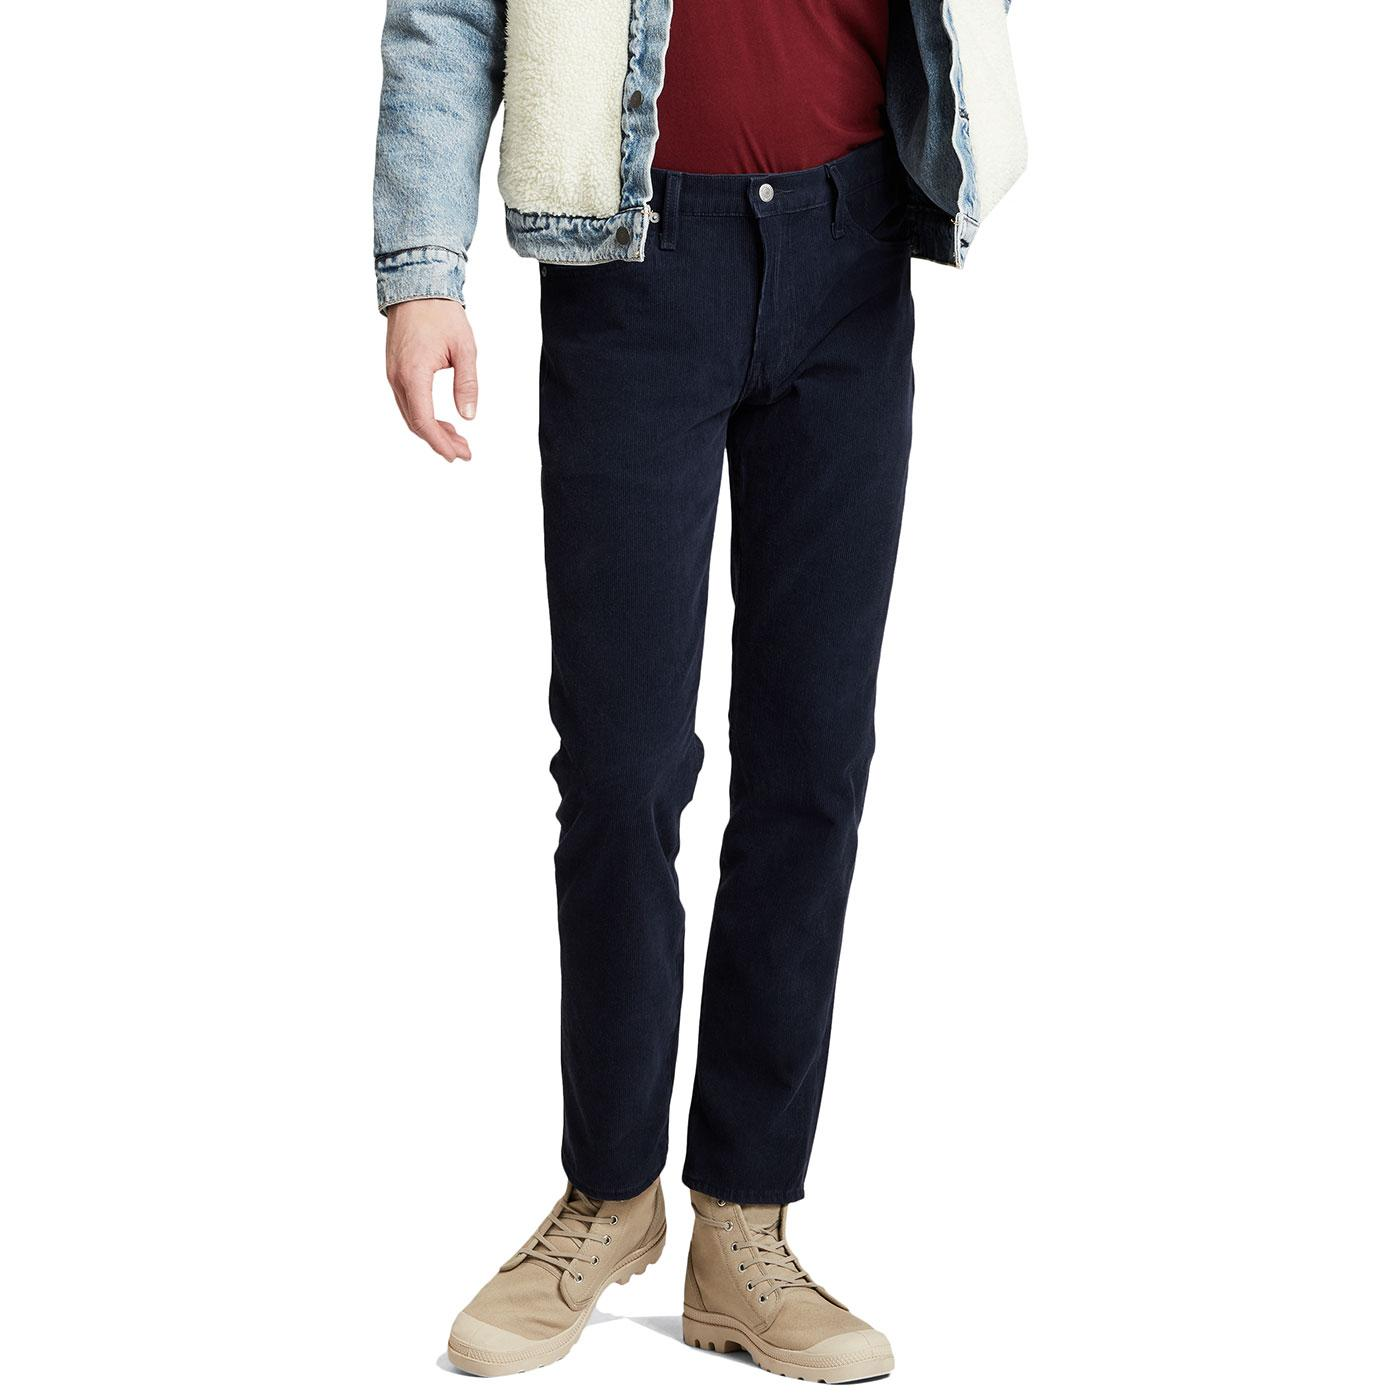 LEVI'S 511 Mod Slim Cord Jeans (Nightwatch Blue)